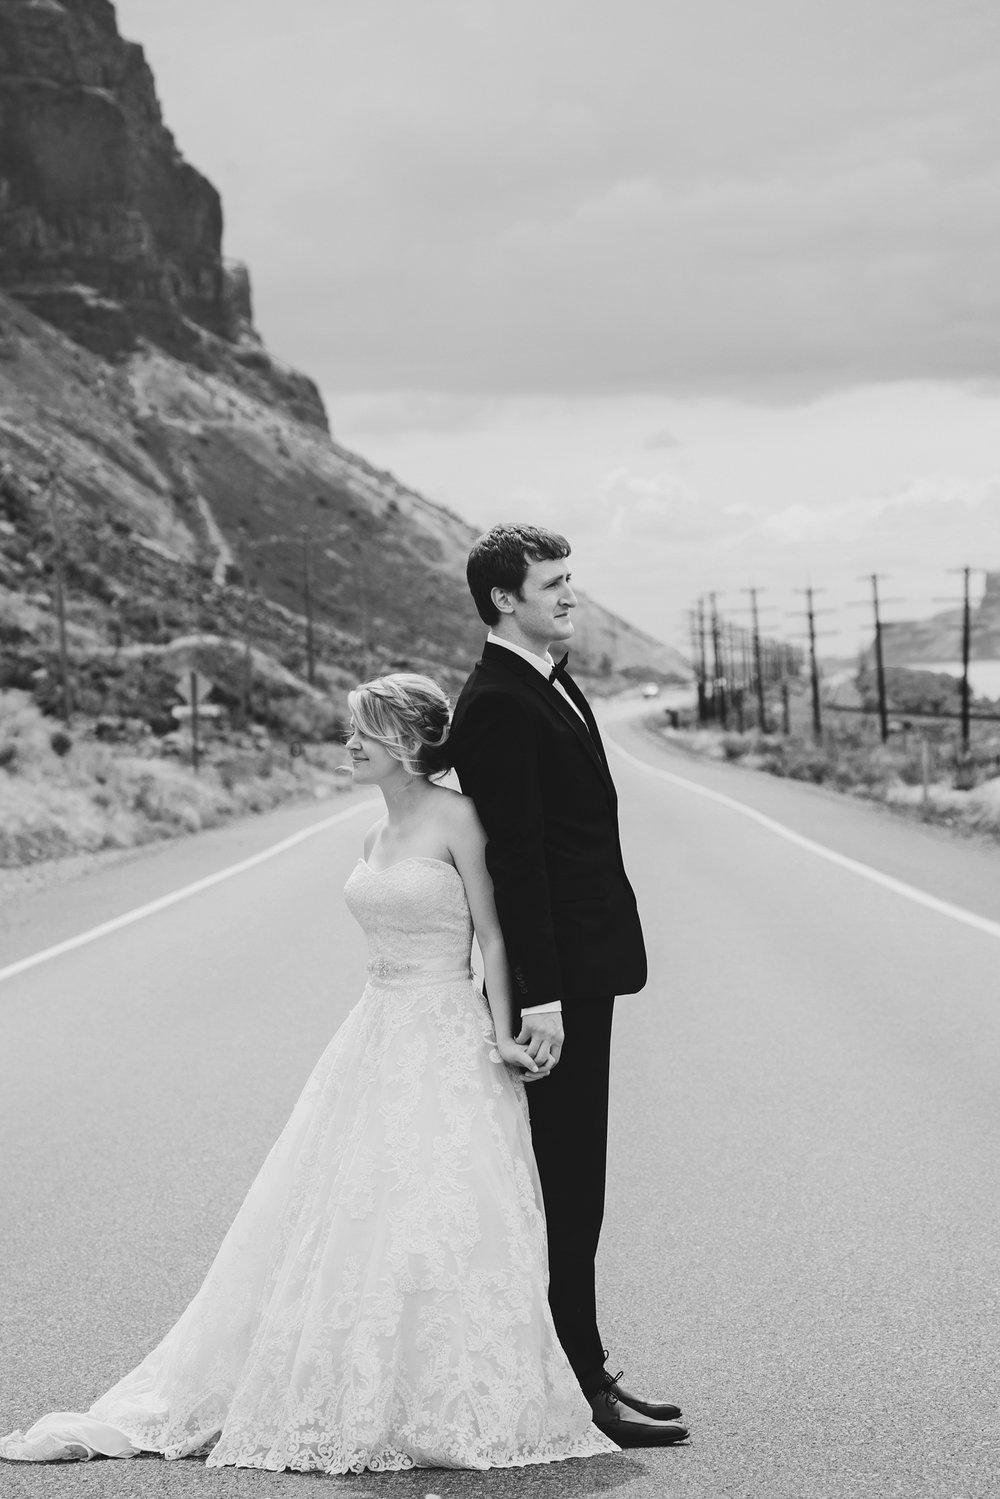 Jordan Edens Photography_Wedding Wednesday_Backup your photos_protect your photos_save your photos_tri cities photographer_kennewick photographer_wedding photographer_6